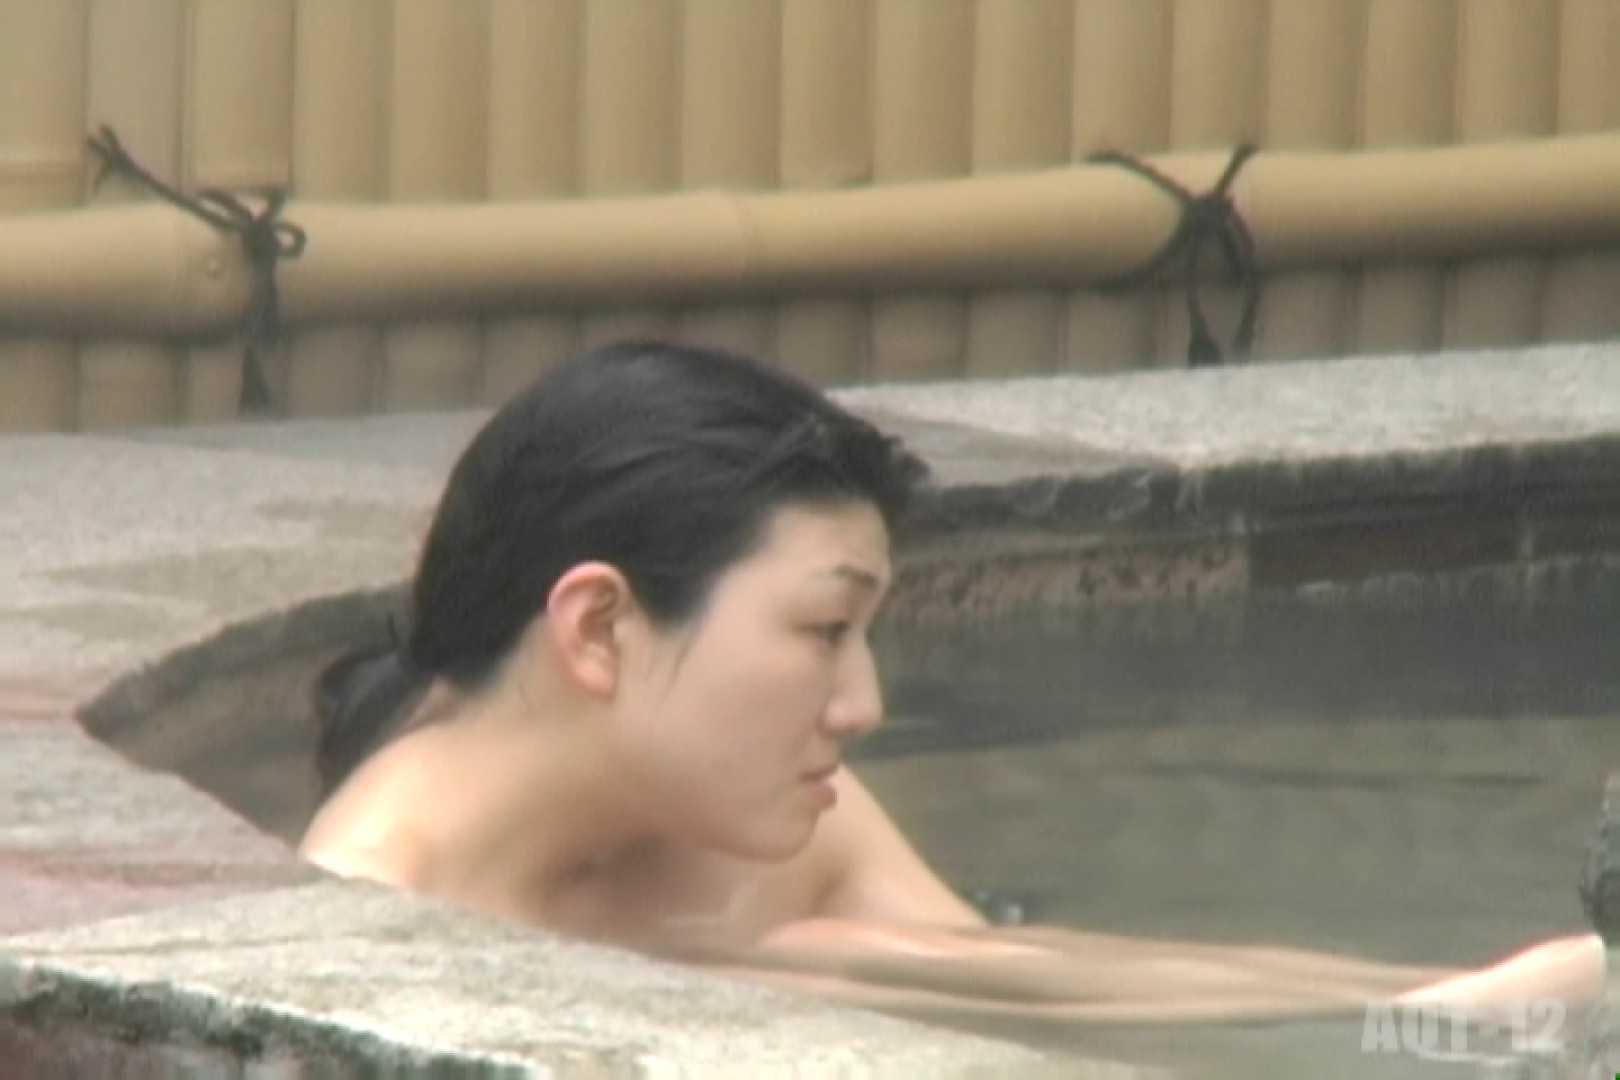 Aquaな露天風呂Vol.810 露天風呂編 | 盗撮シリーズ  108PIX 49